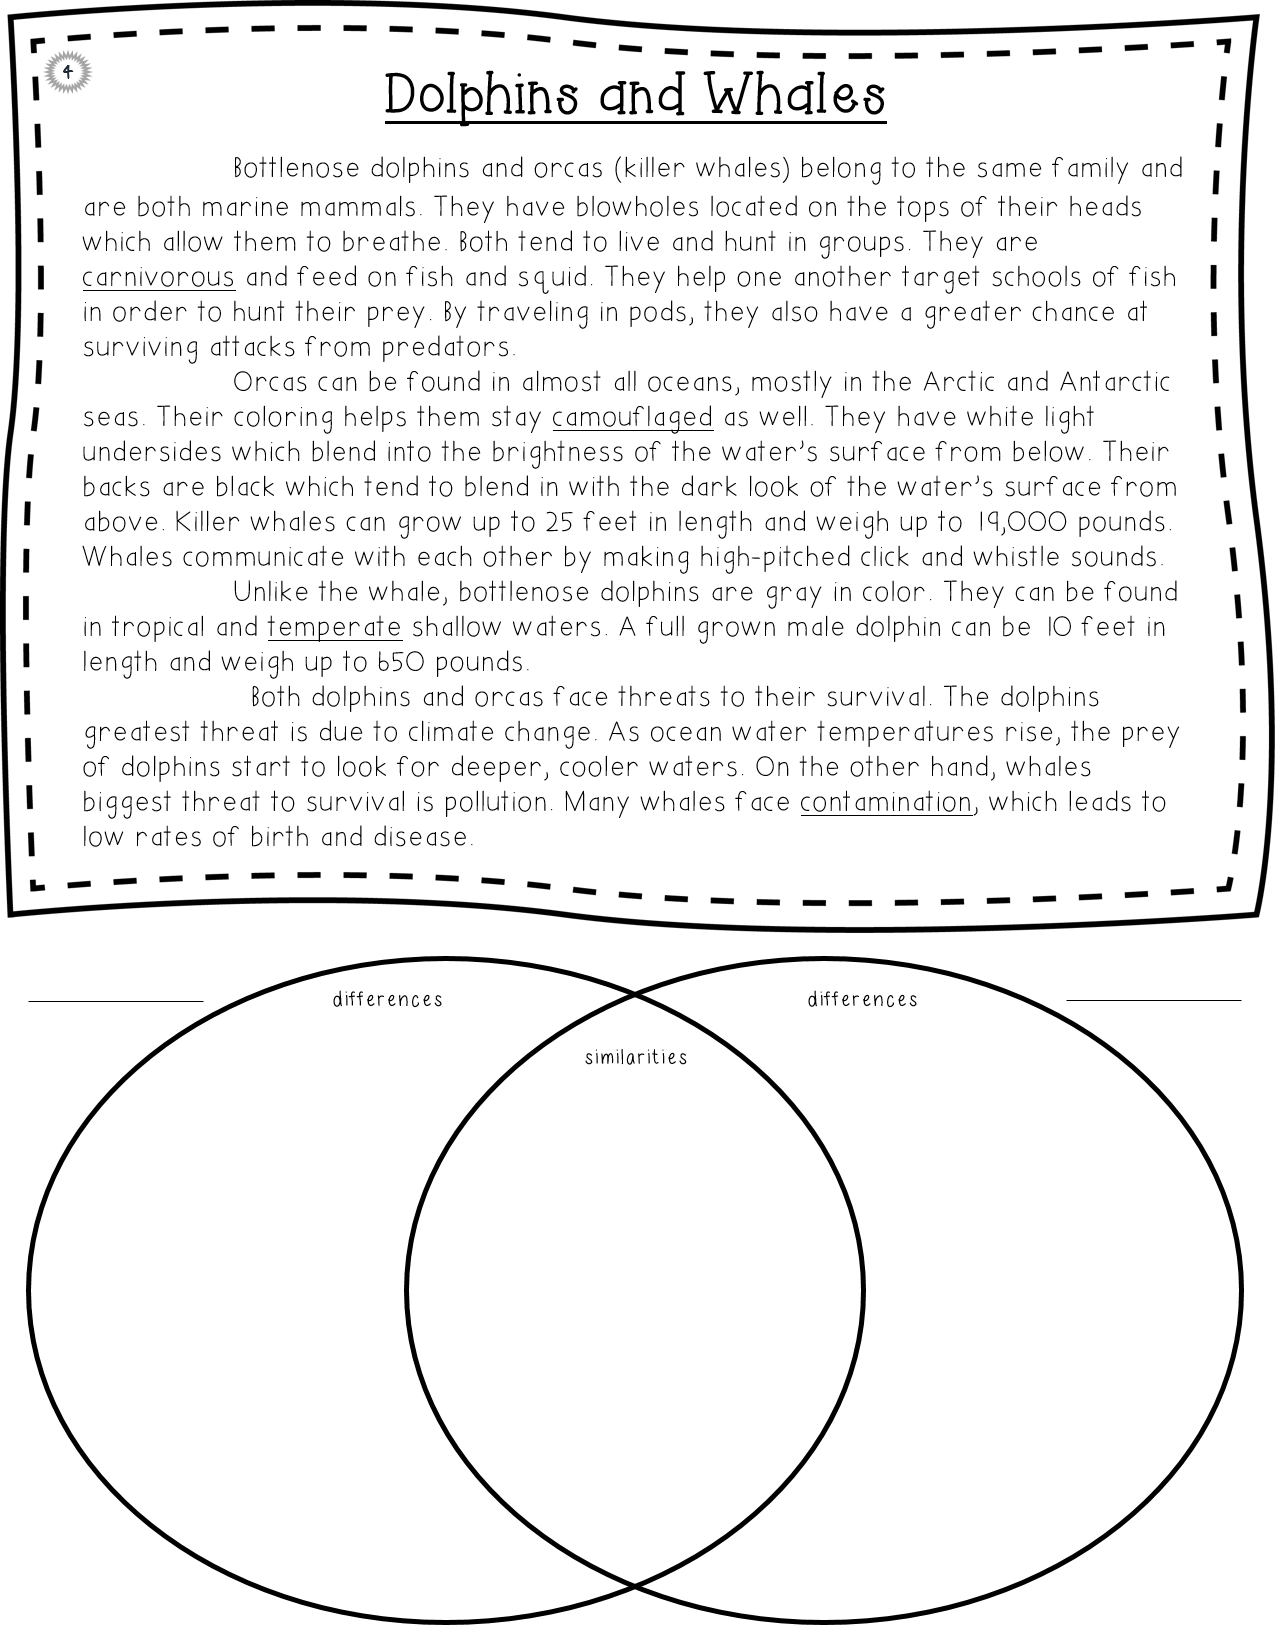 grade 2 venn diagram worksheets baldor motor wiring diagrams single phase short informational passages to teach students how